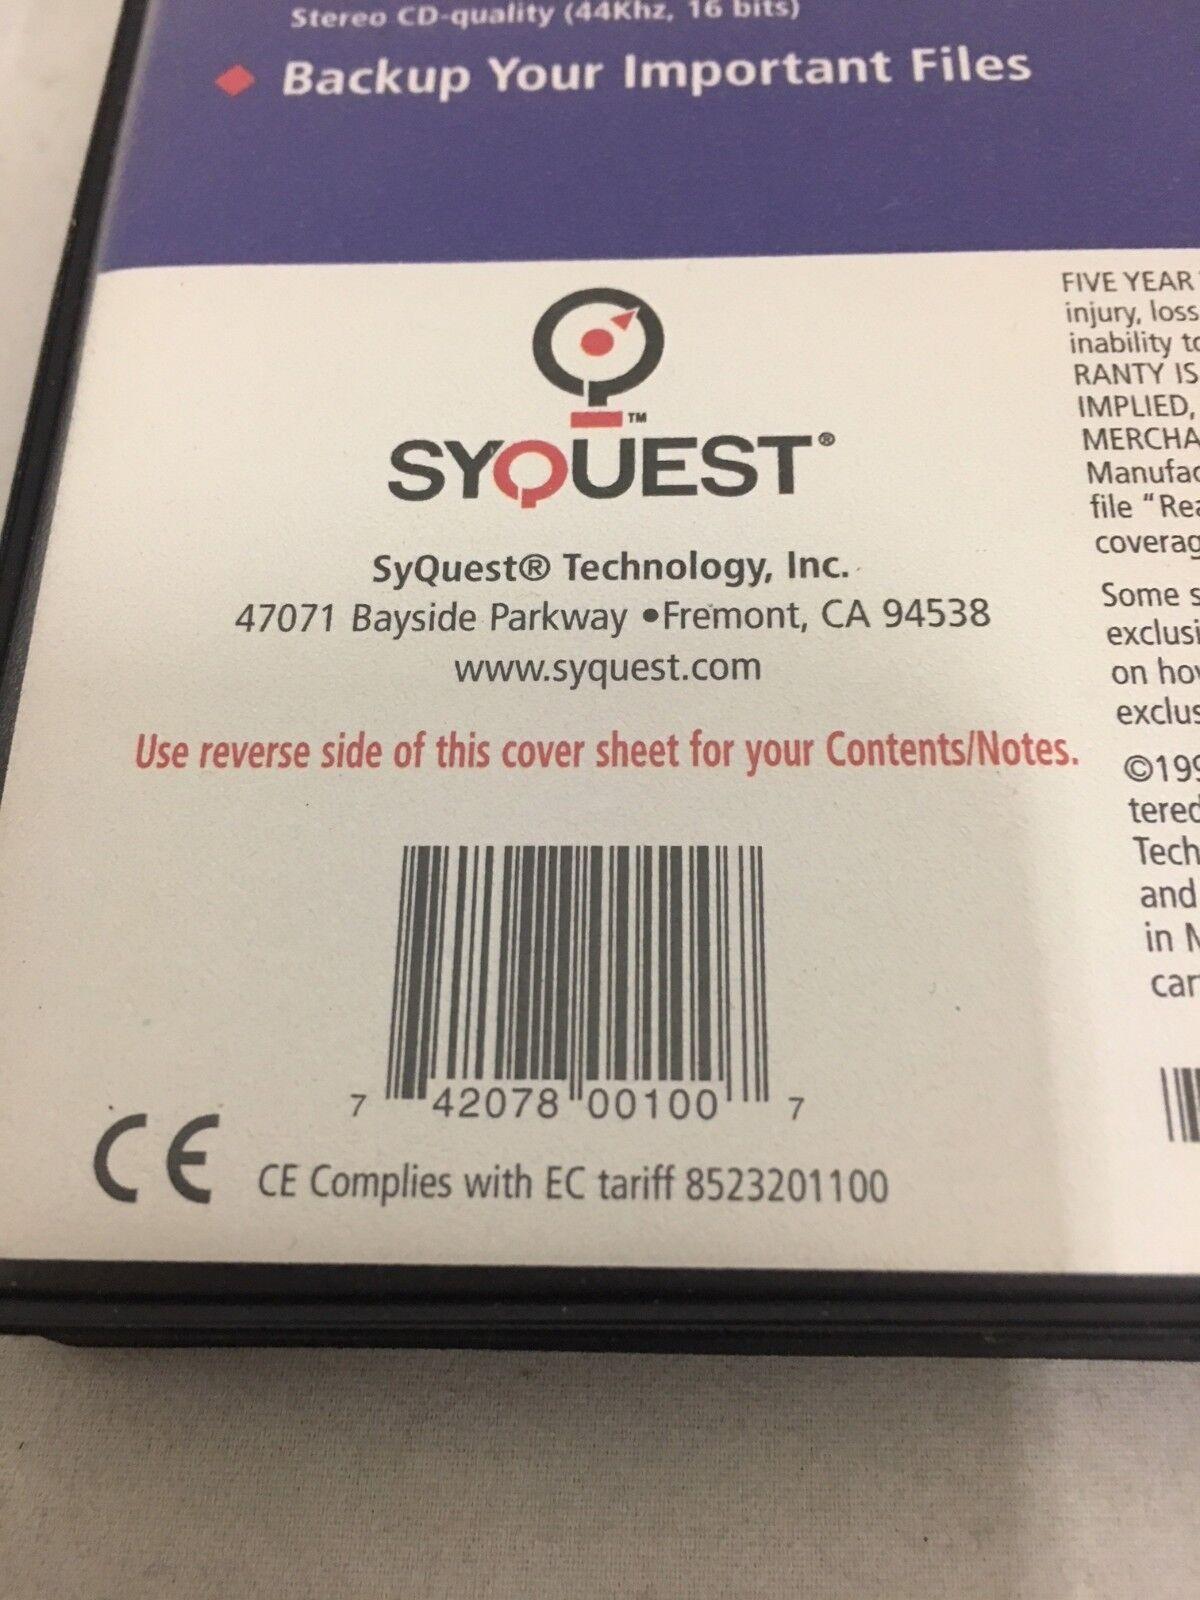 как выглядит Дисковод для гибкого магнитного диска (дискеты) Syquest SparQ 1.0GB Hard Disk PC Formatted Starter Disk фото